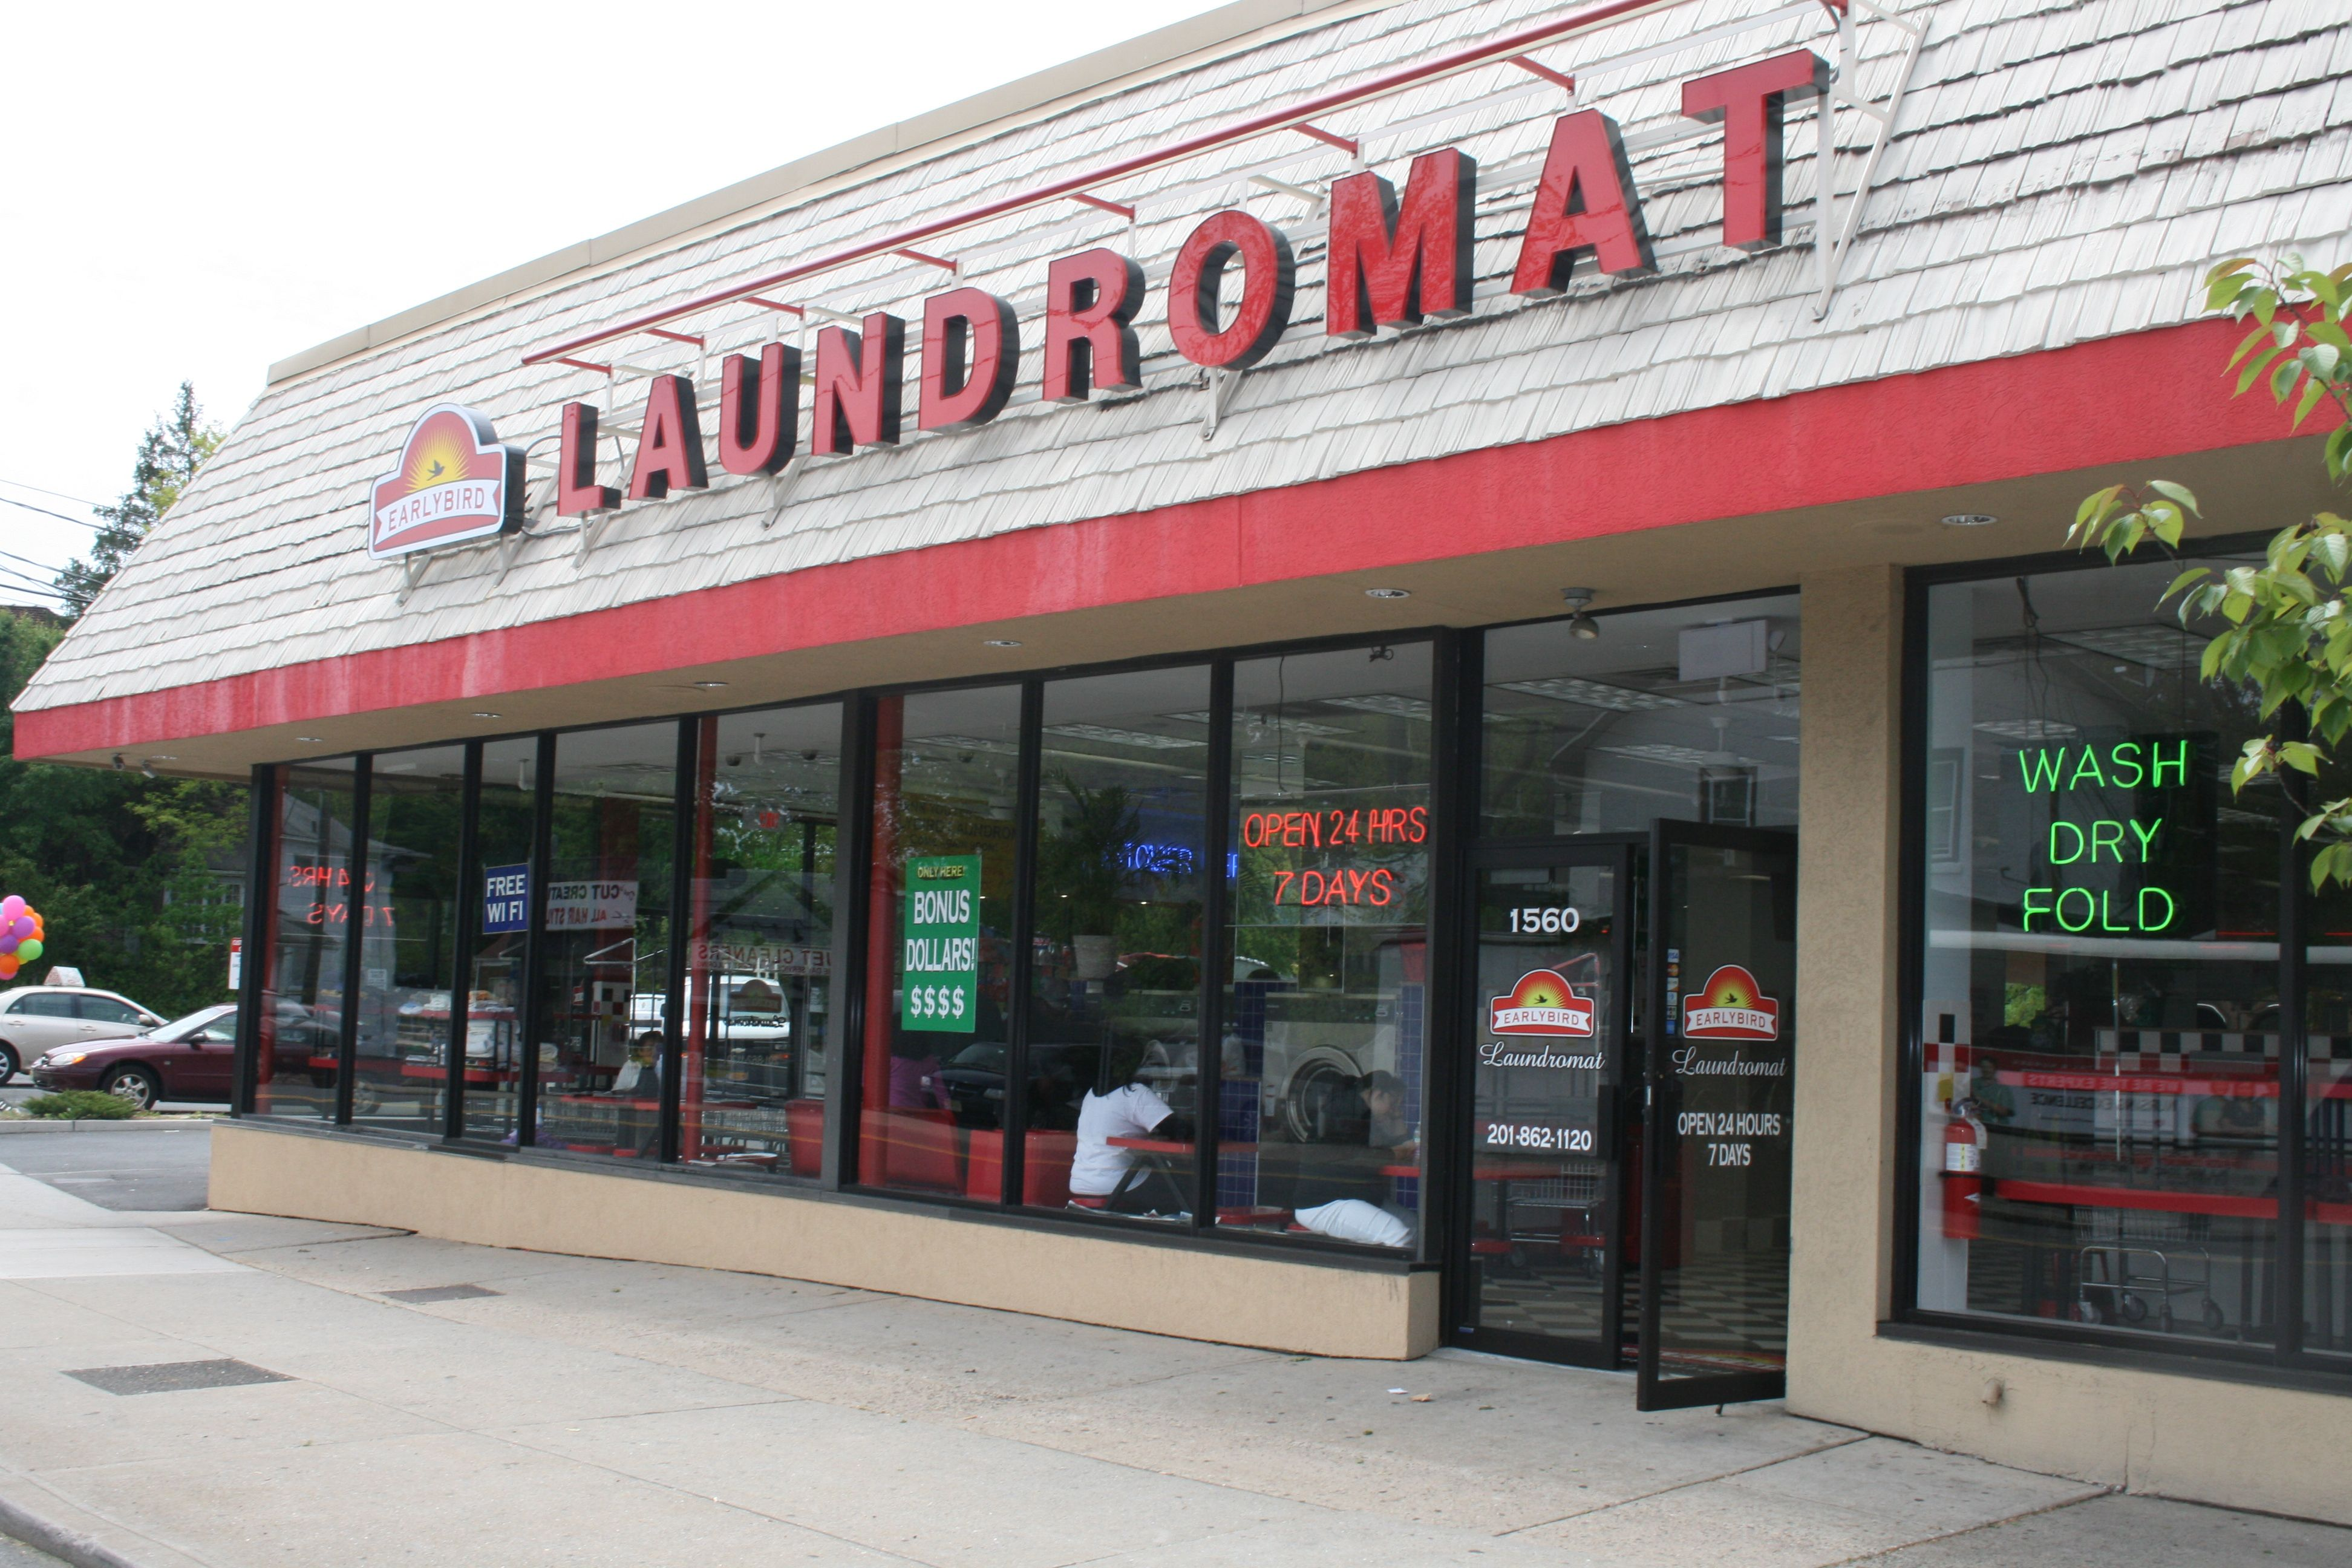 24 Hour Laundromat Teaneck Nj Earlybird Laundromat Teaneck